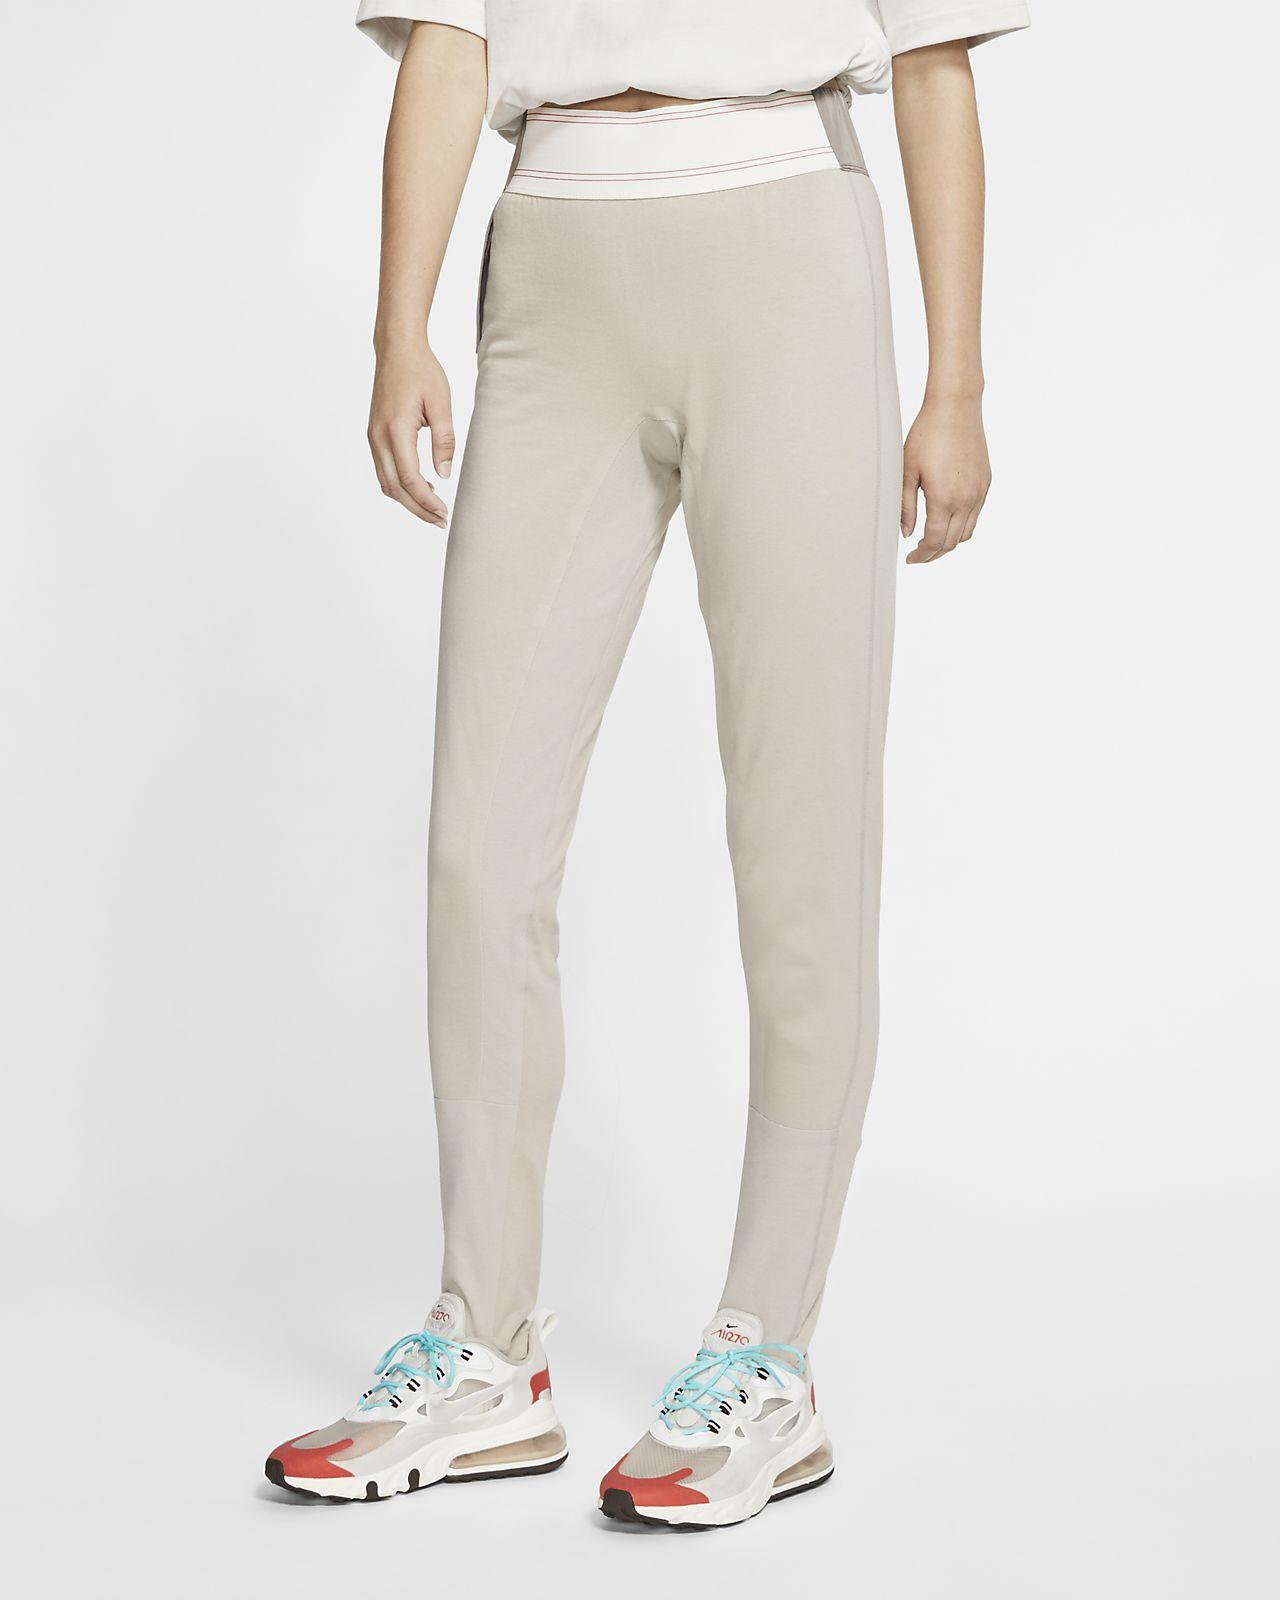 Nike A.A.E. Women's Tights